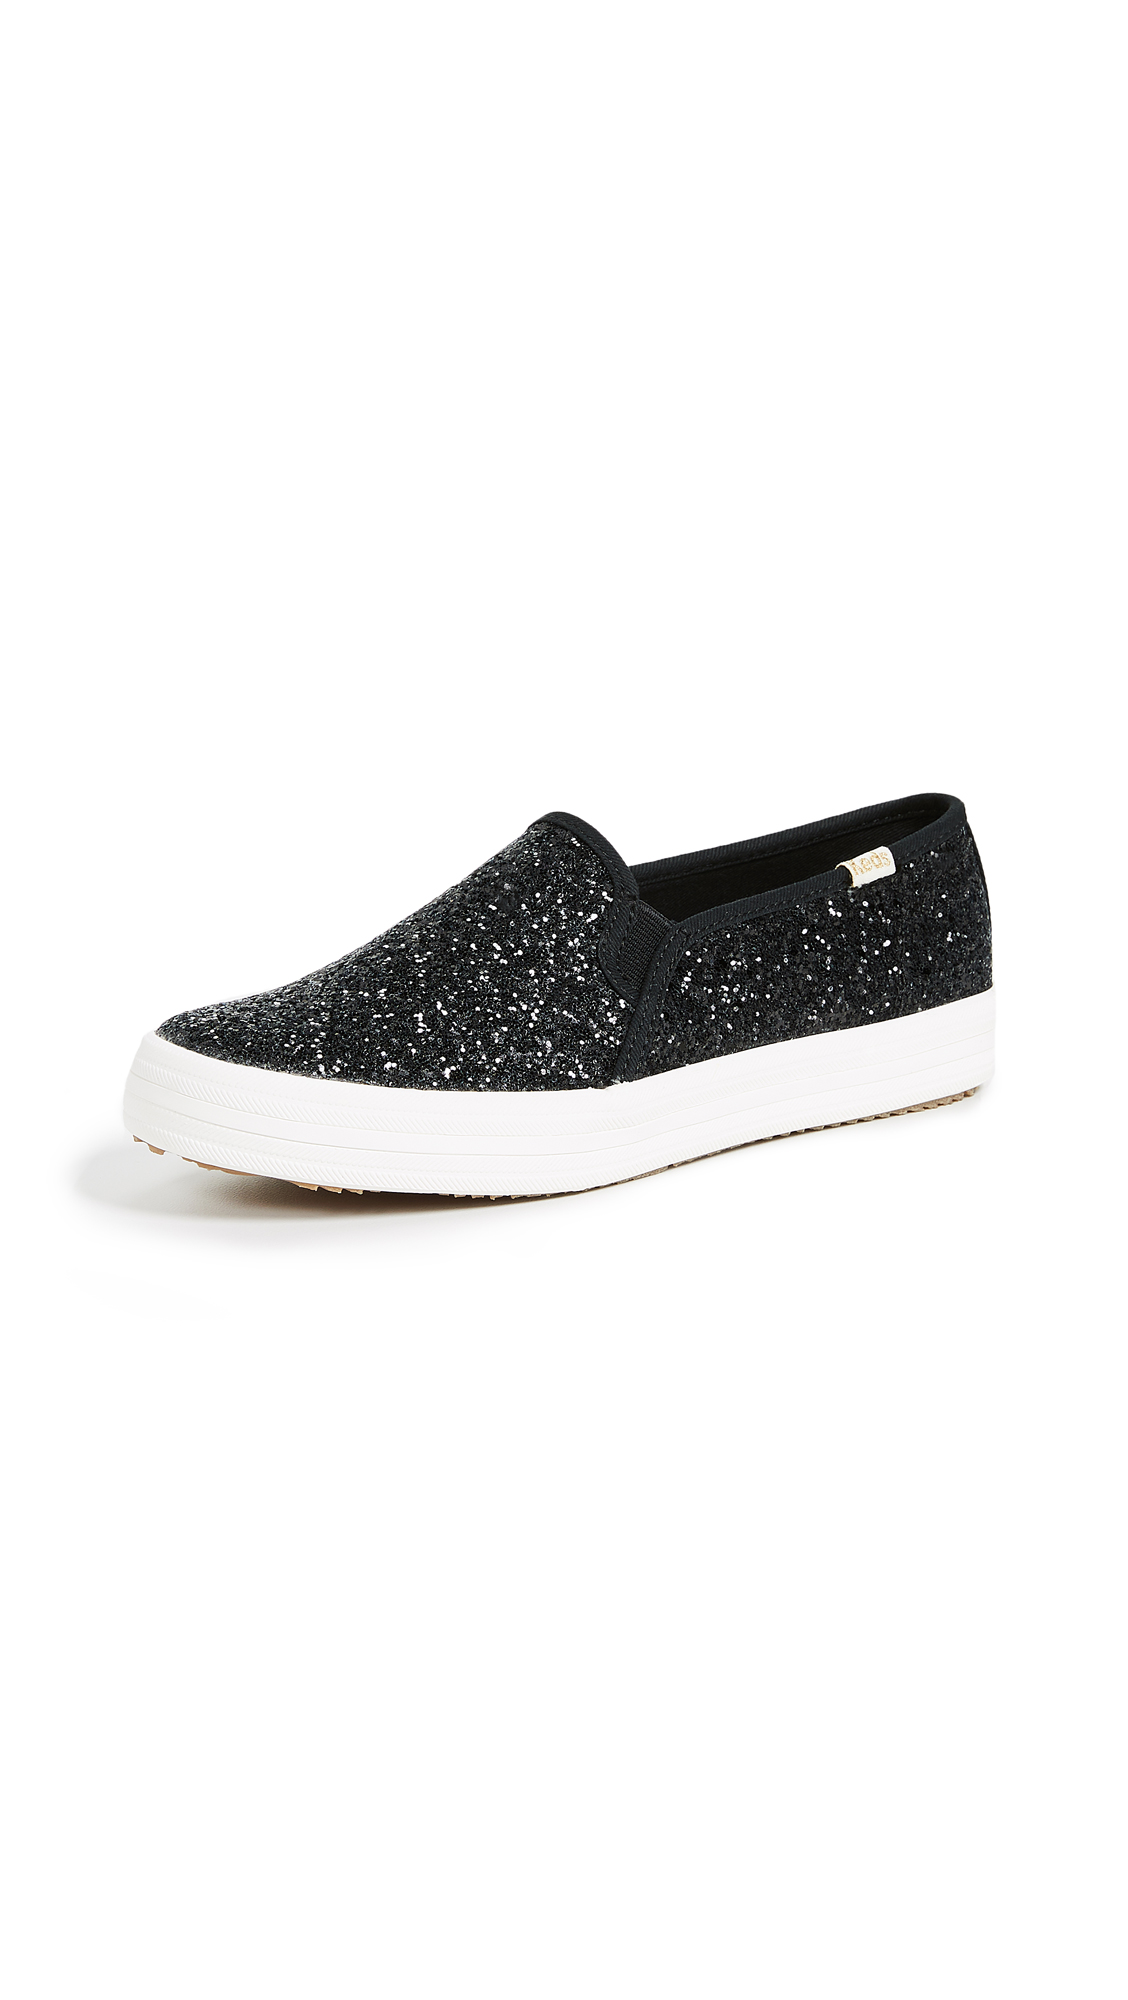 Keds x Kate Spade Double Decker Slip On Sneakers - Black